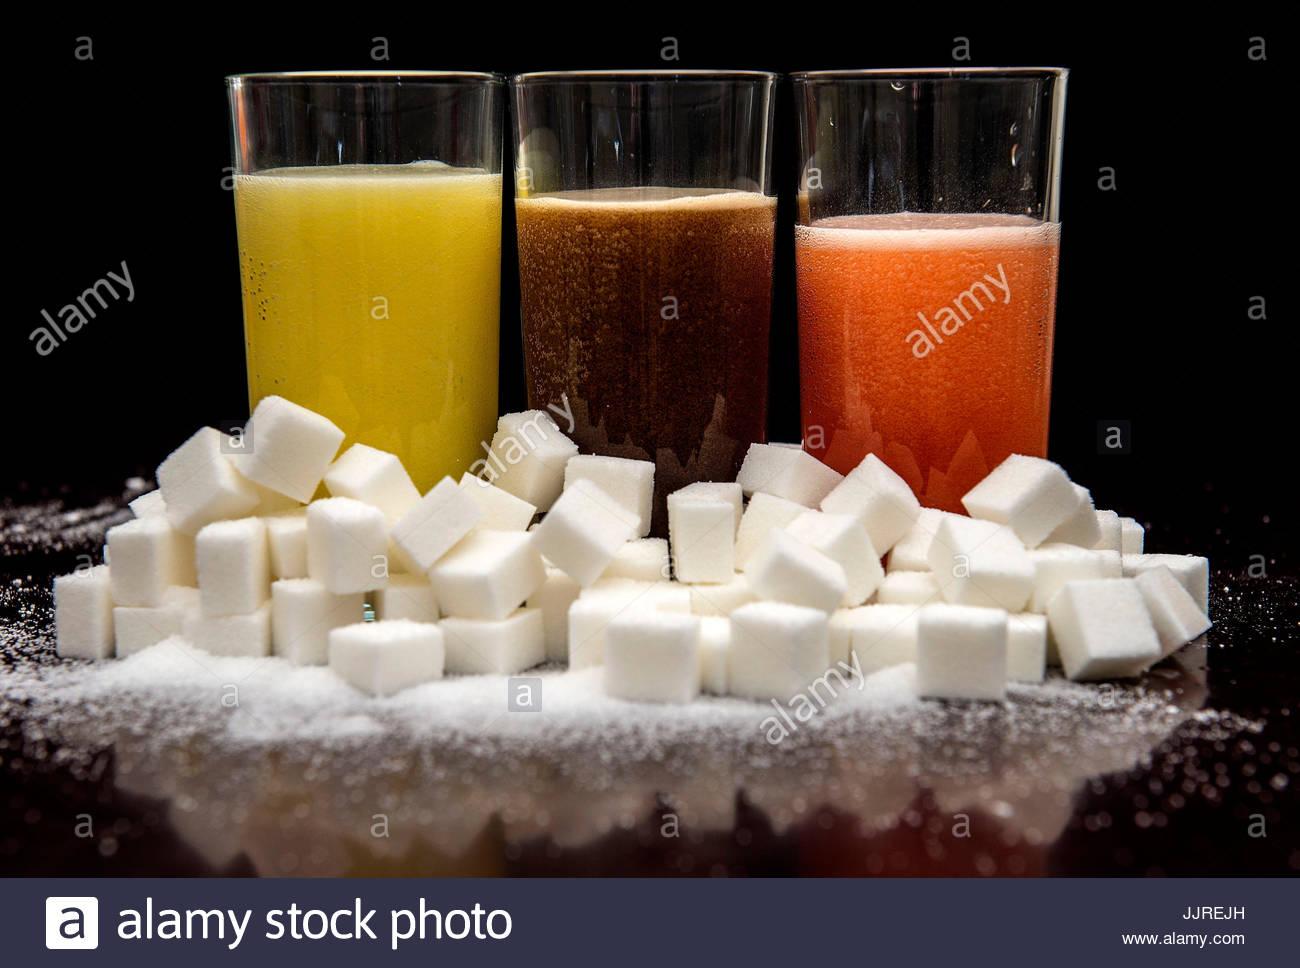 Zucker Zucker Datierung